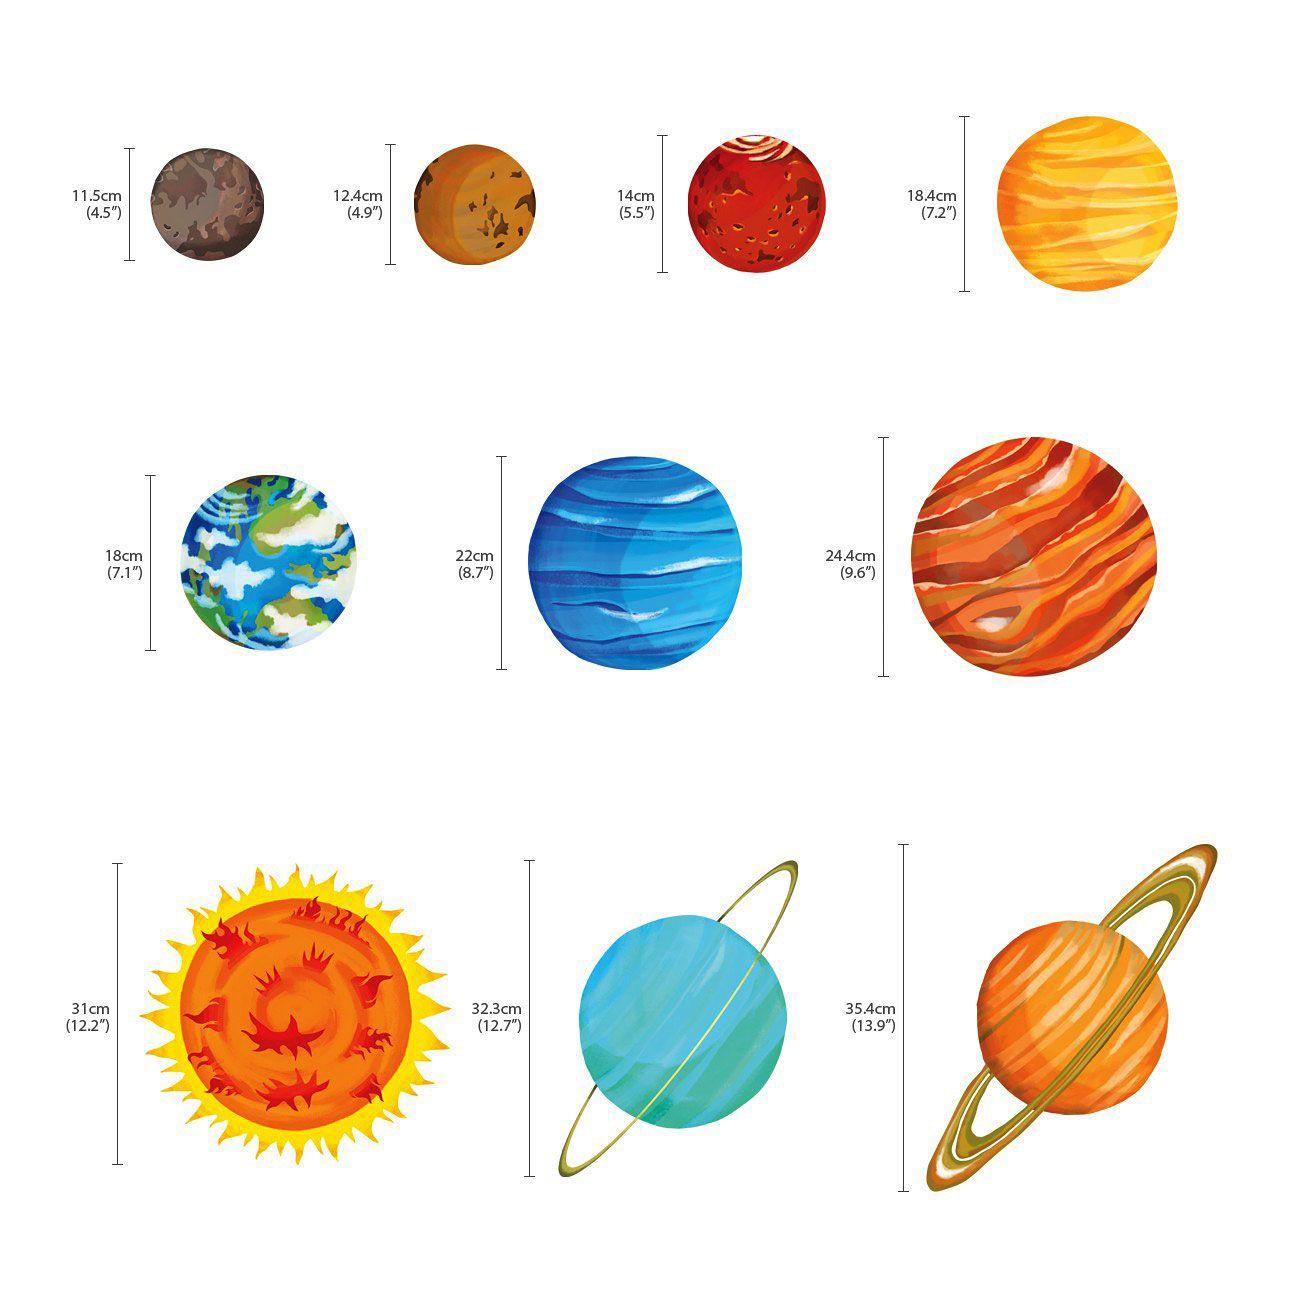 Wandsticker Planeten Sonnensystem Weltraum In 2020 Weltraum Sonnensystem Planeten